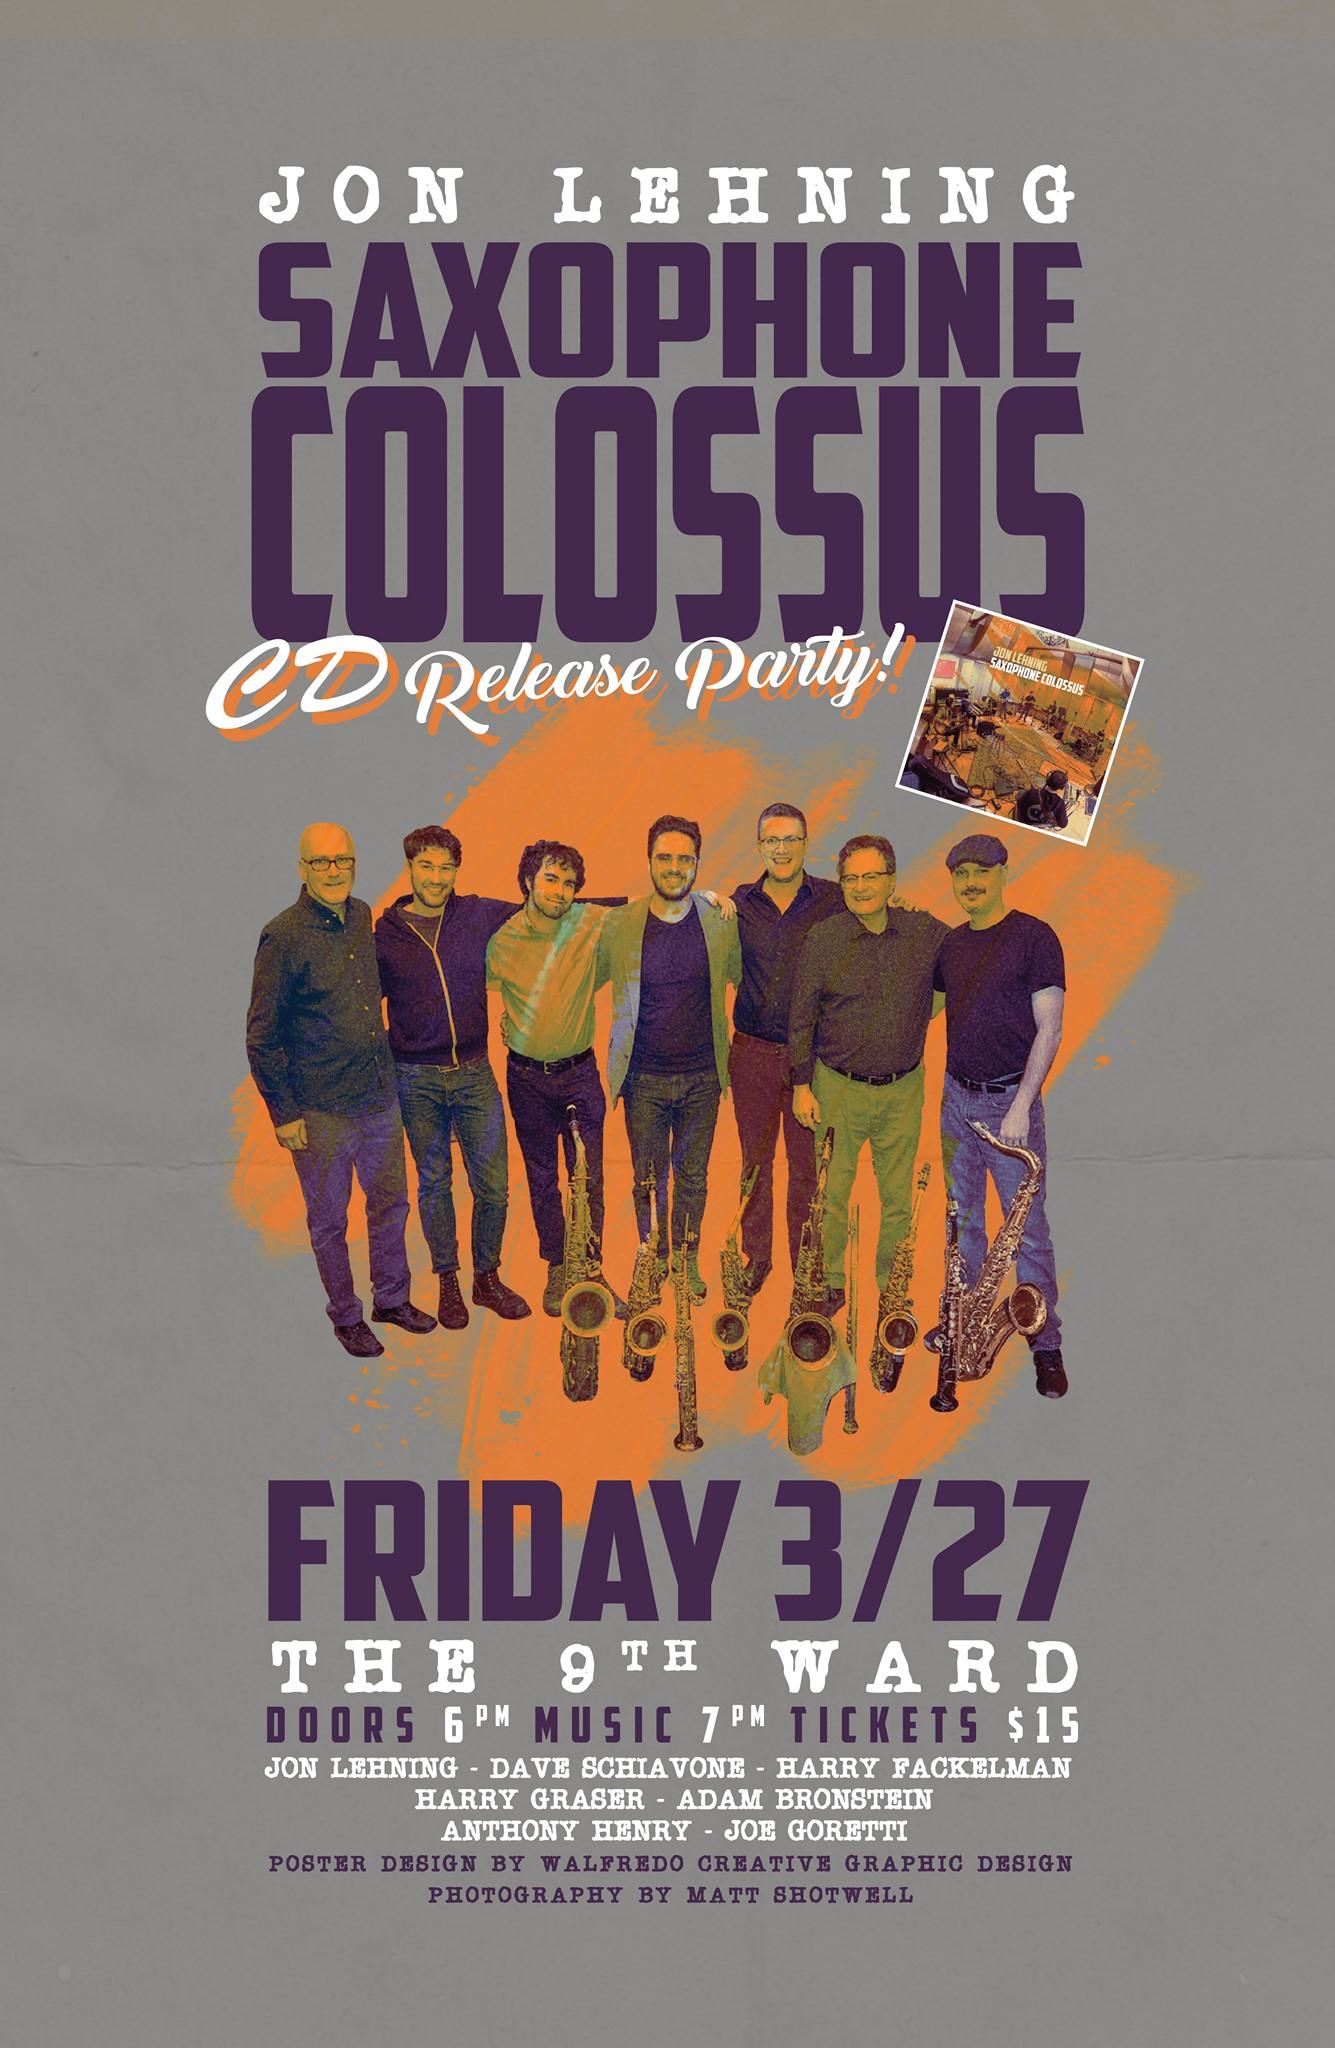 *POSTPONED* Jon Lehning Saxophone Colossus CD Release Party